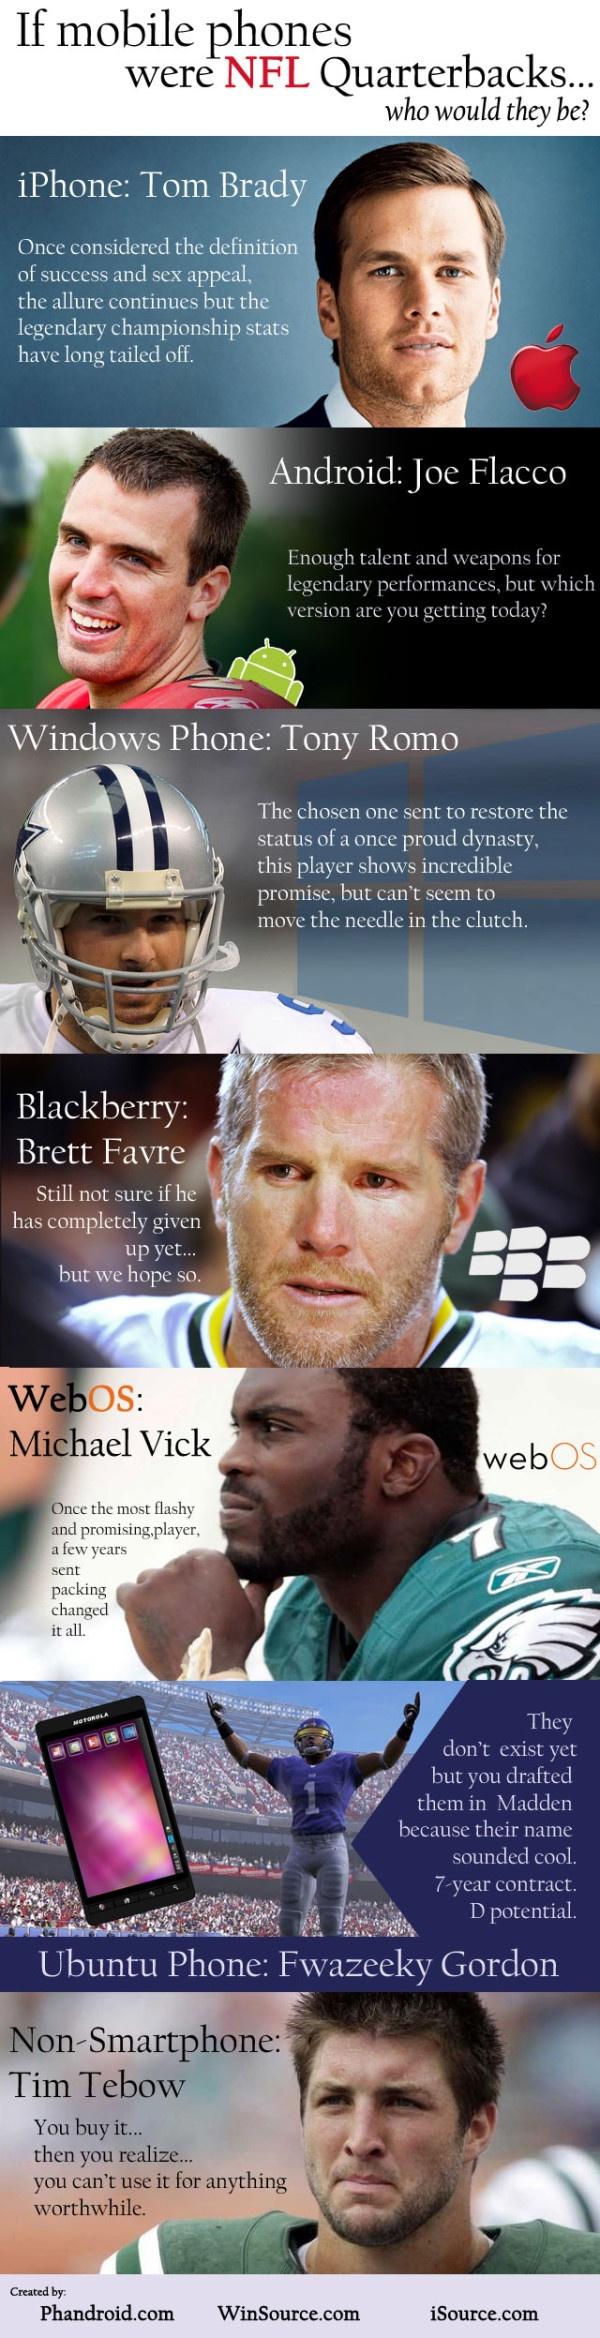 If NFL Quarterbacks Were Mobile Phones